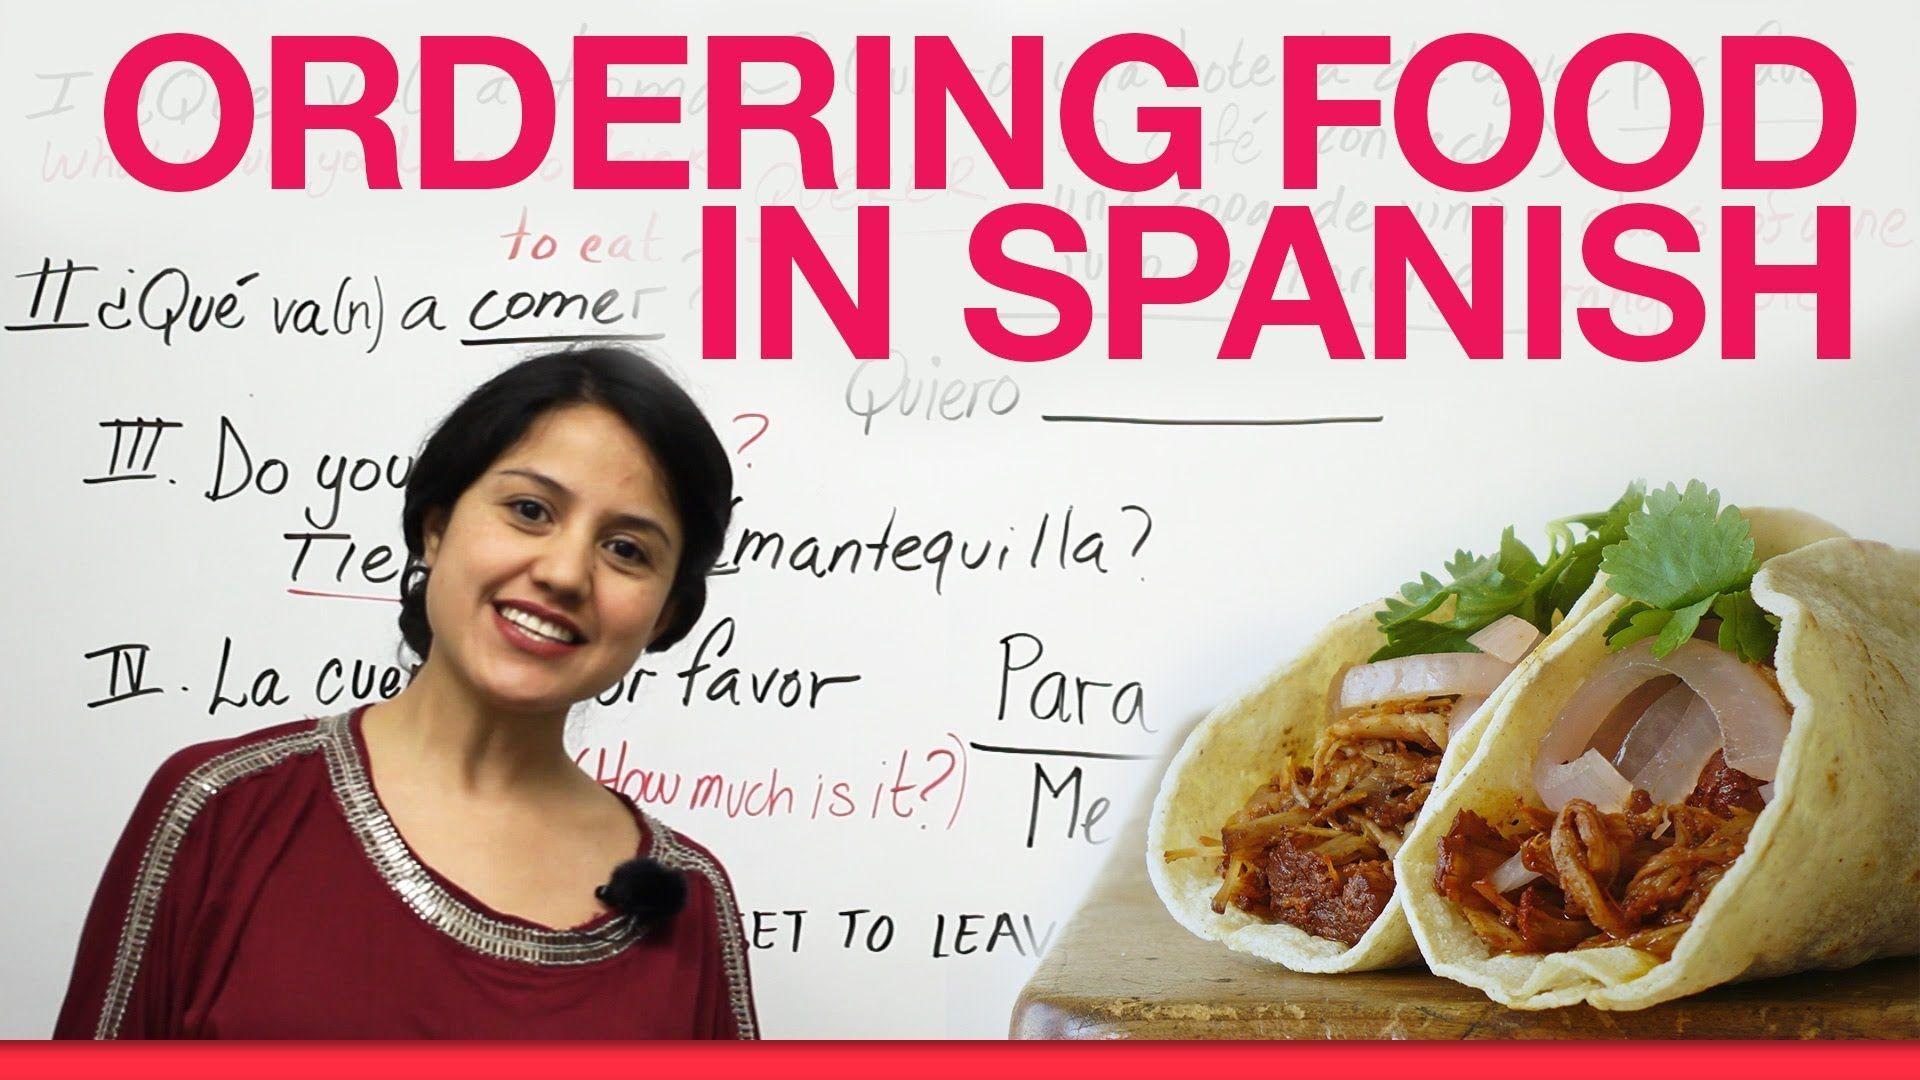 Learning Spanish Ordering Food In Spanish Www Fu Tenerife Com Spanish Food Unit Spanish Butterfly Spanish